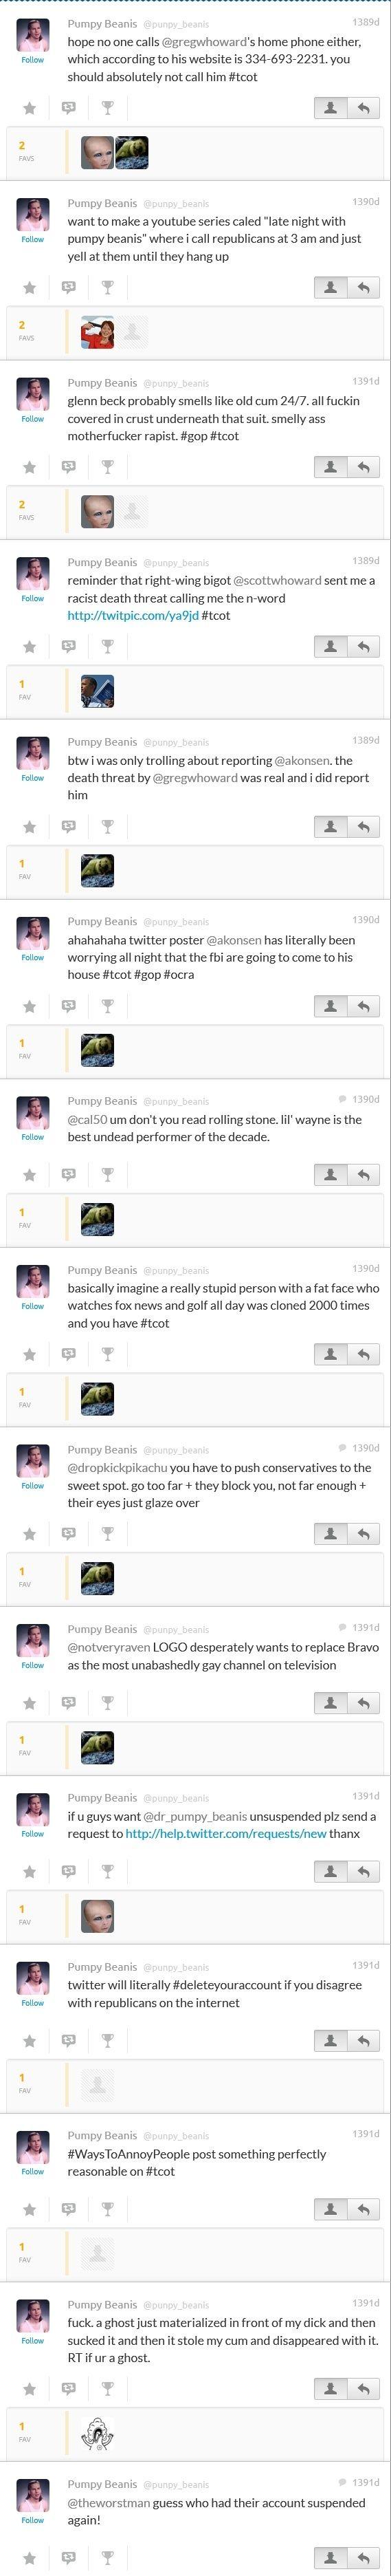 2010 FavStar tweets by BeanDog Pumpy Beanis 857_sc10